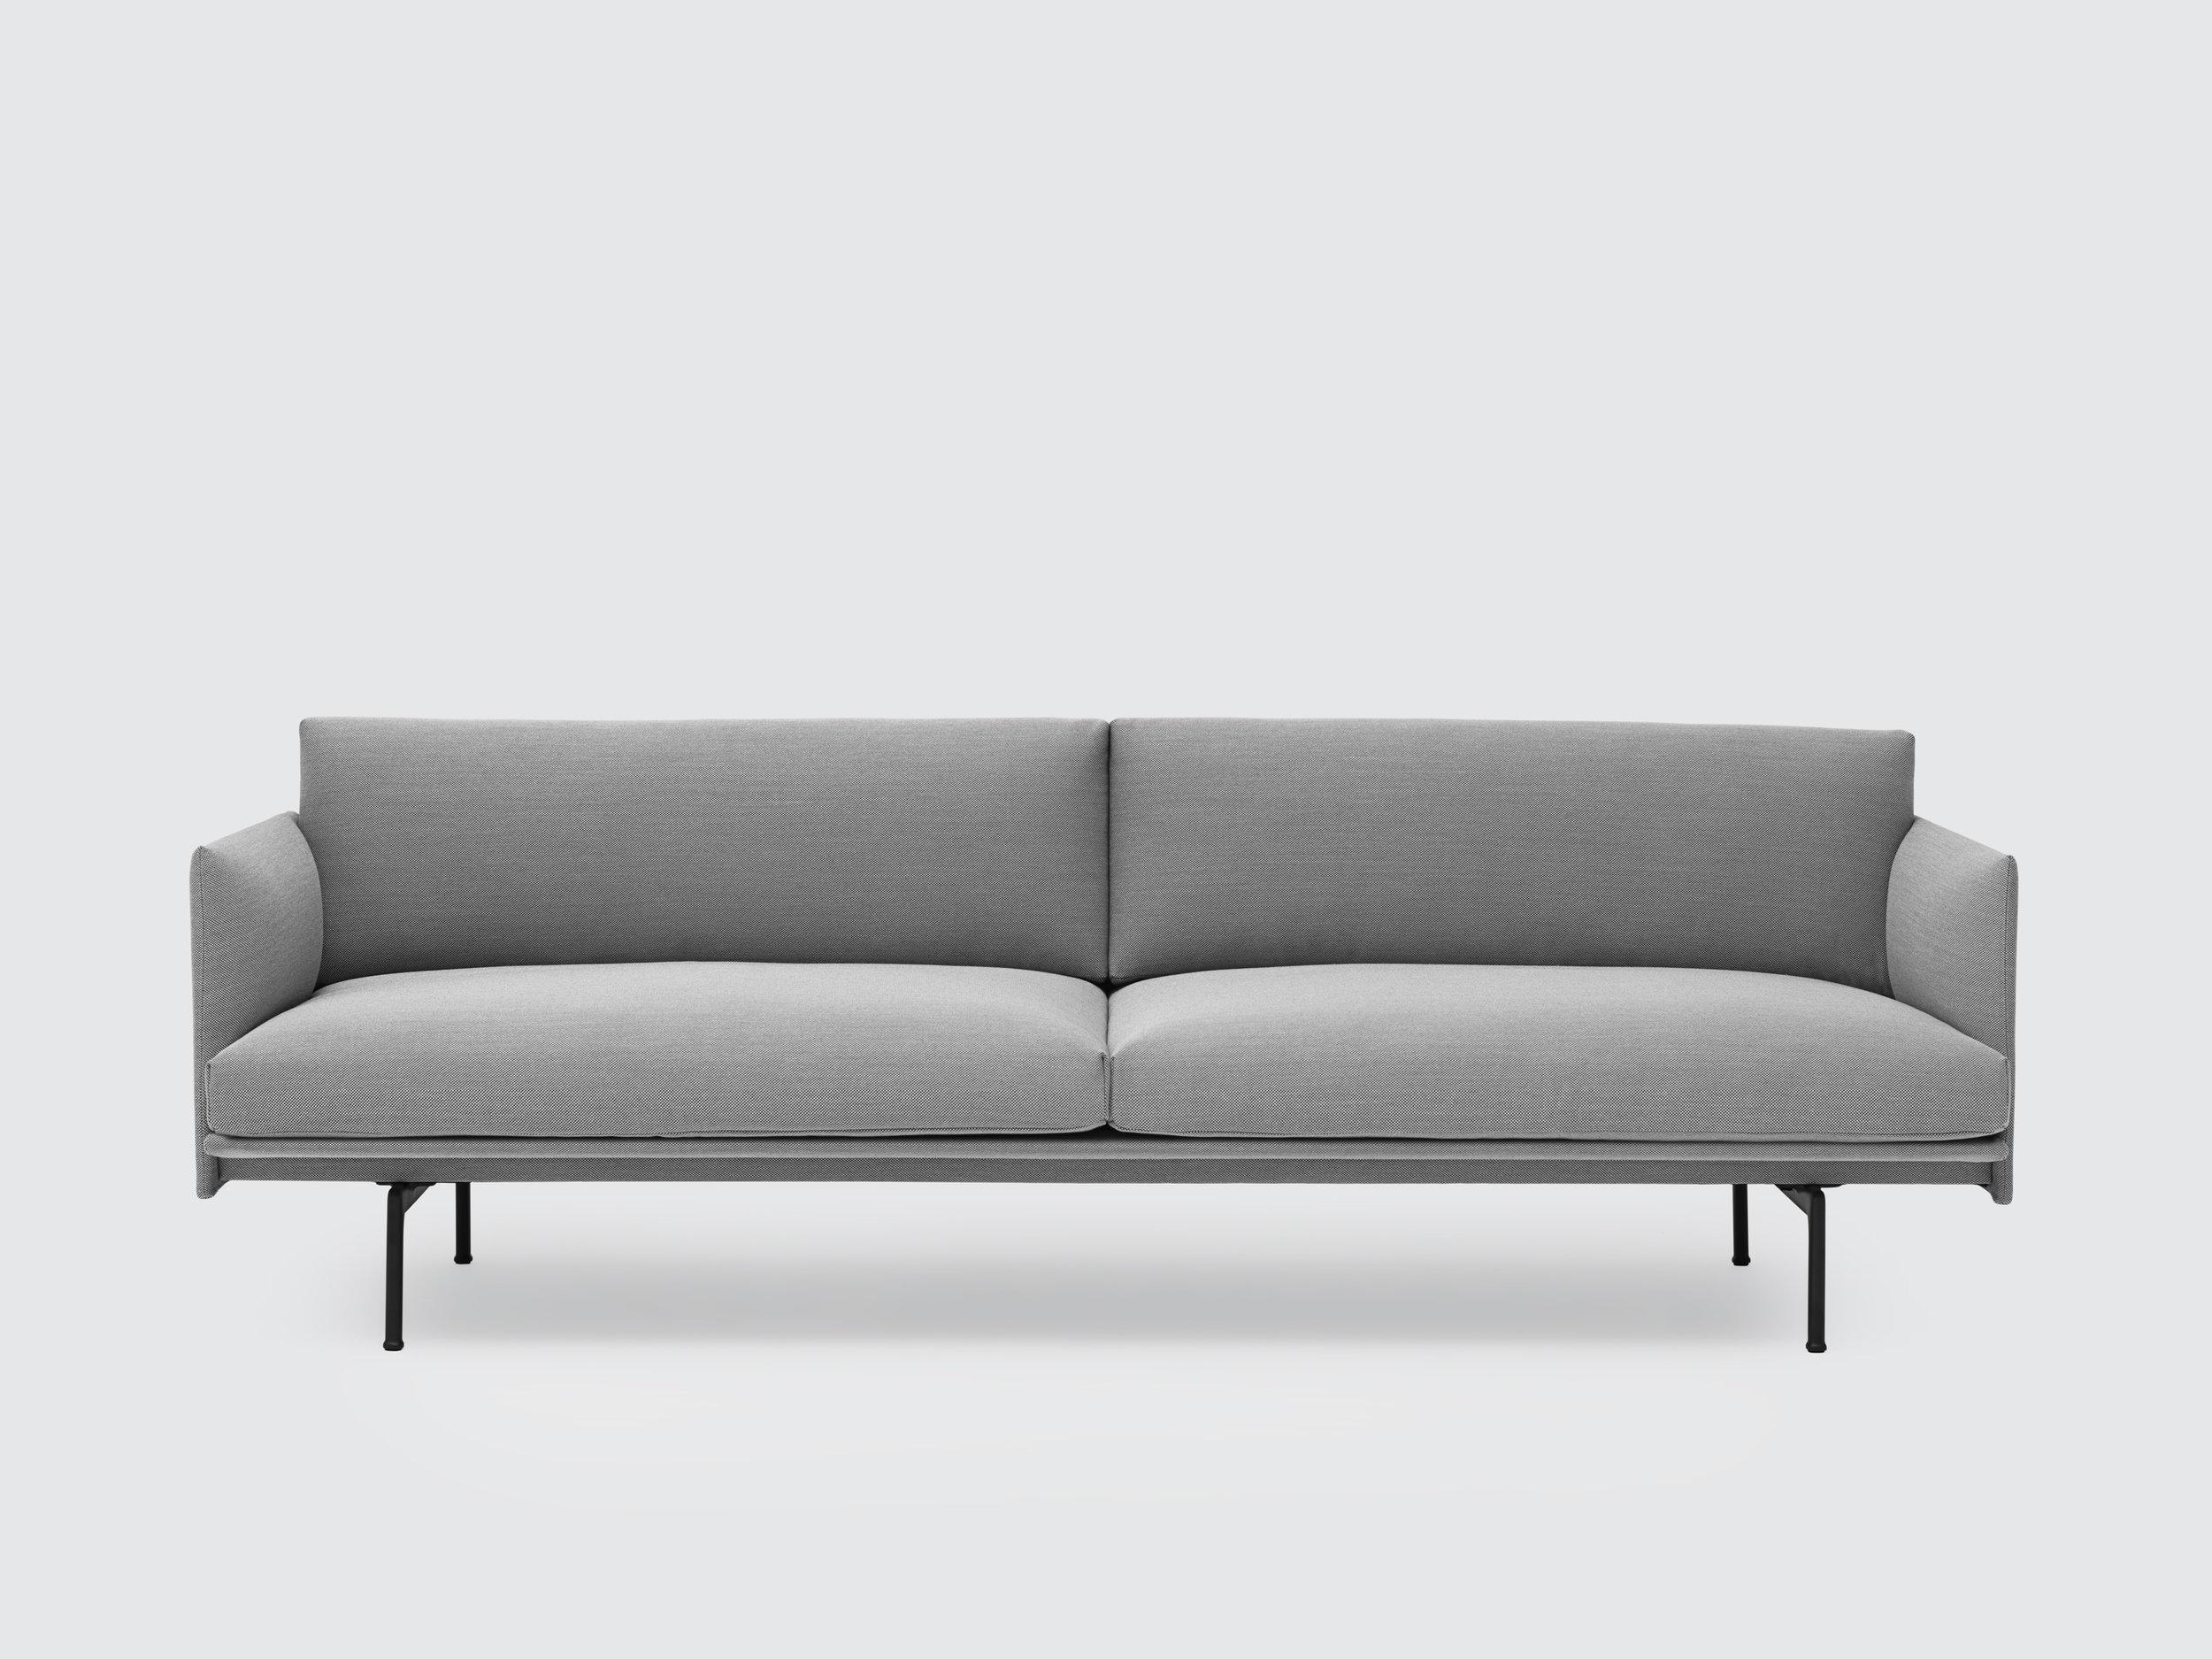 Outline_sofa_3_seater_steelcut_trio_0133-1.jpg